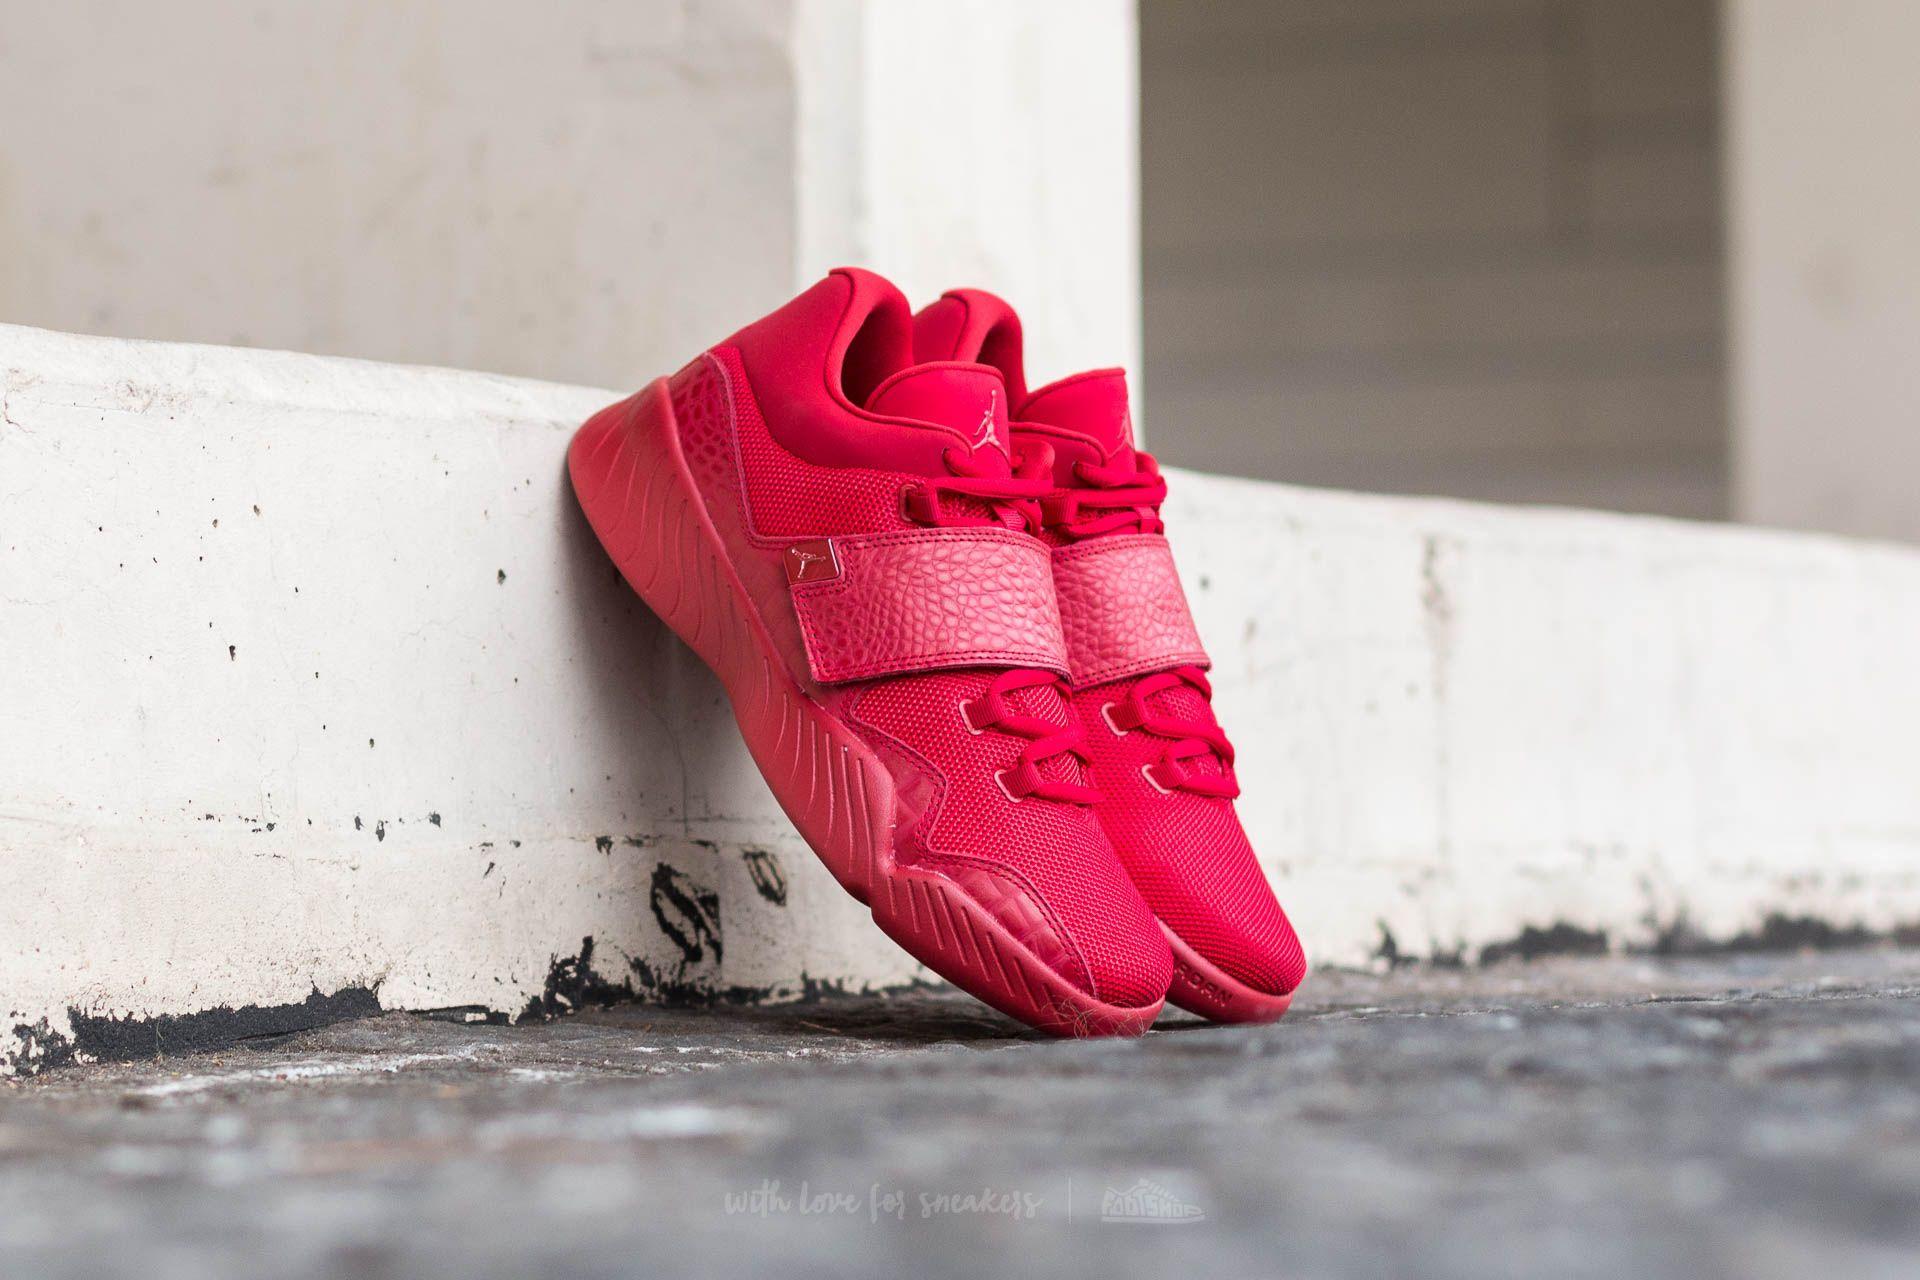 b5c8030d772 Jordan J23 Gym Red